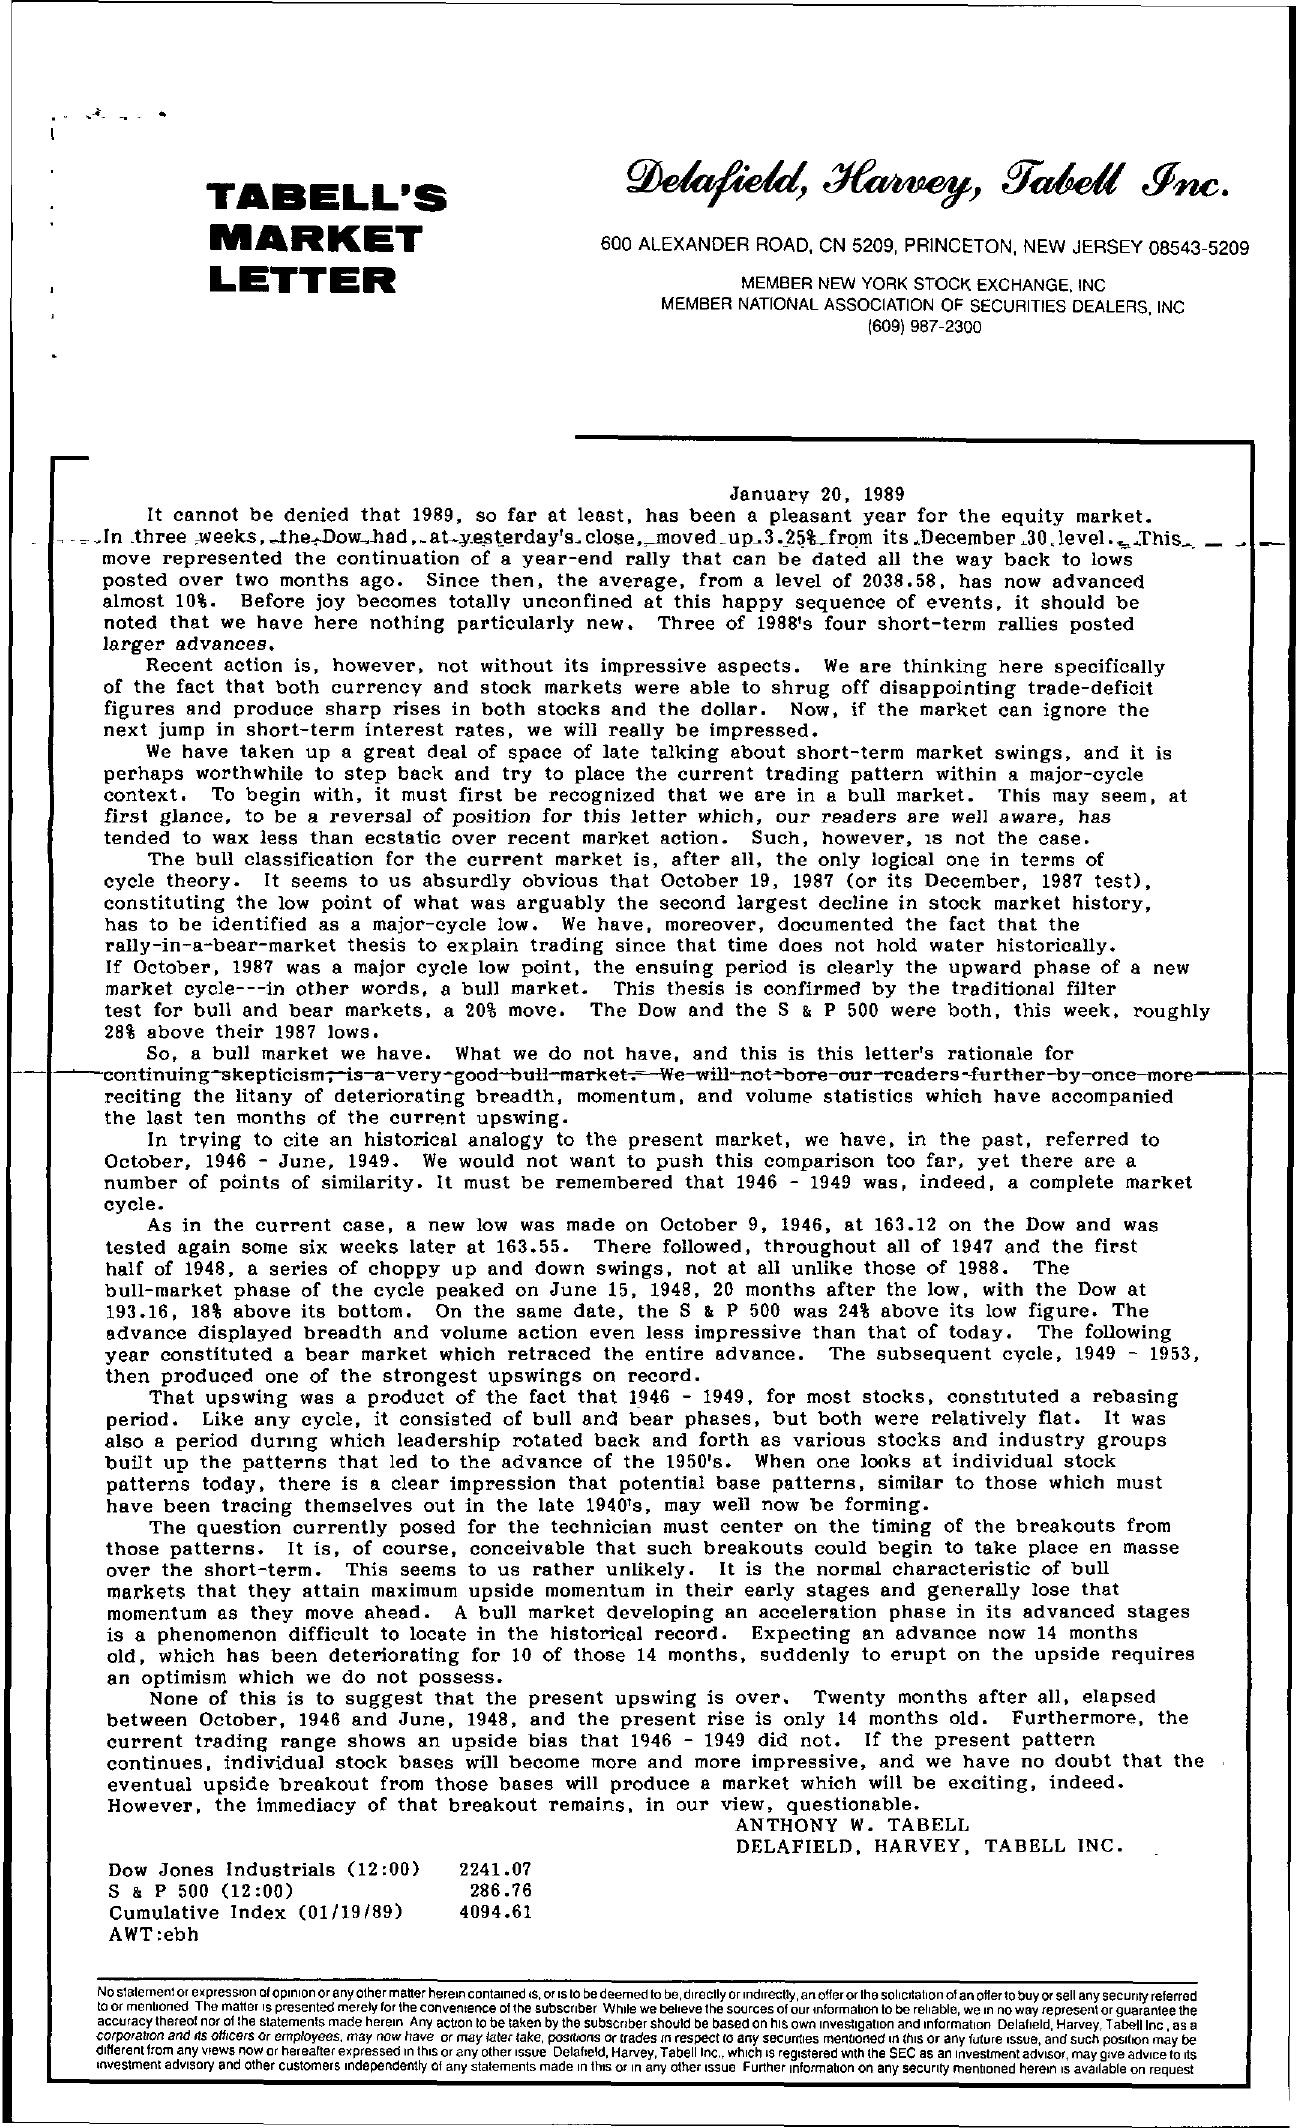 Tabell's Market Letter - January 20, 1989